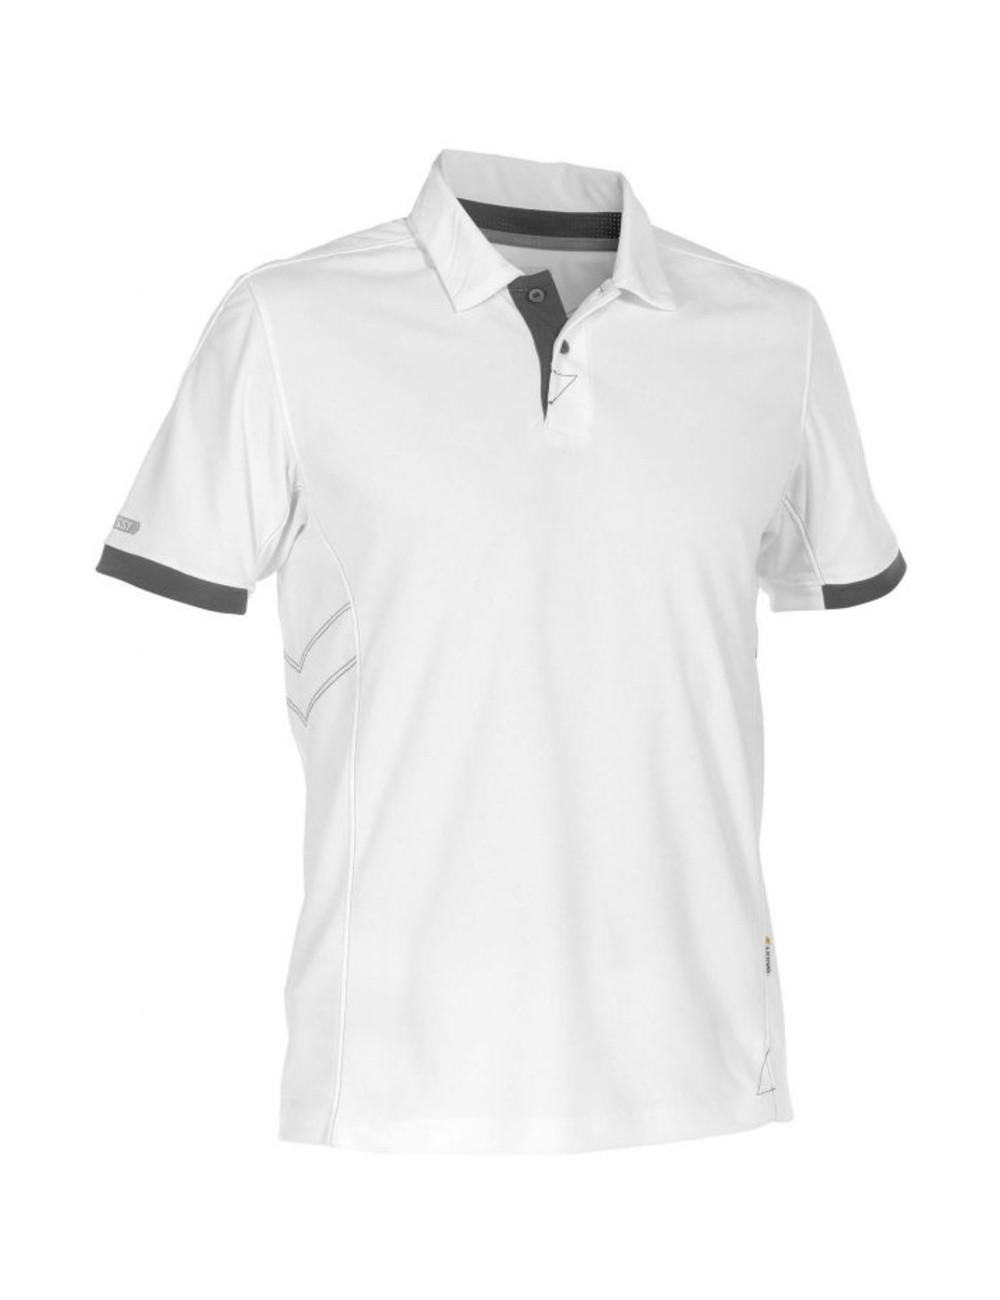 Koszulka Polo Dassy Traxion